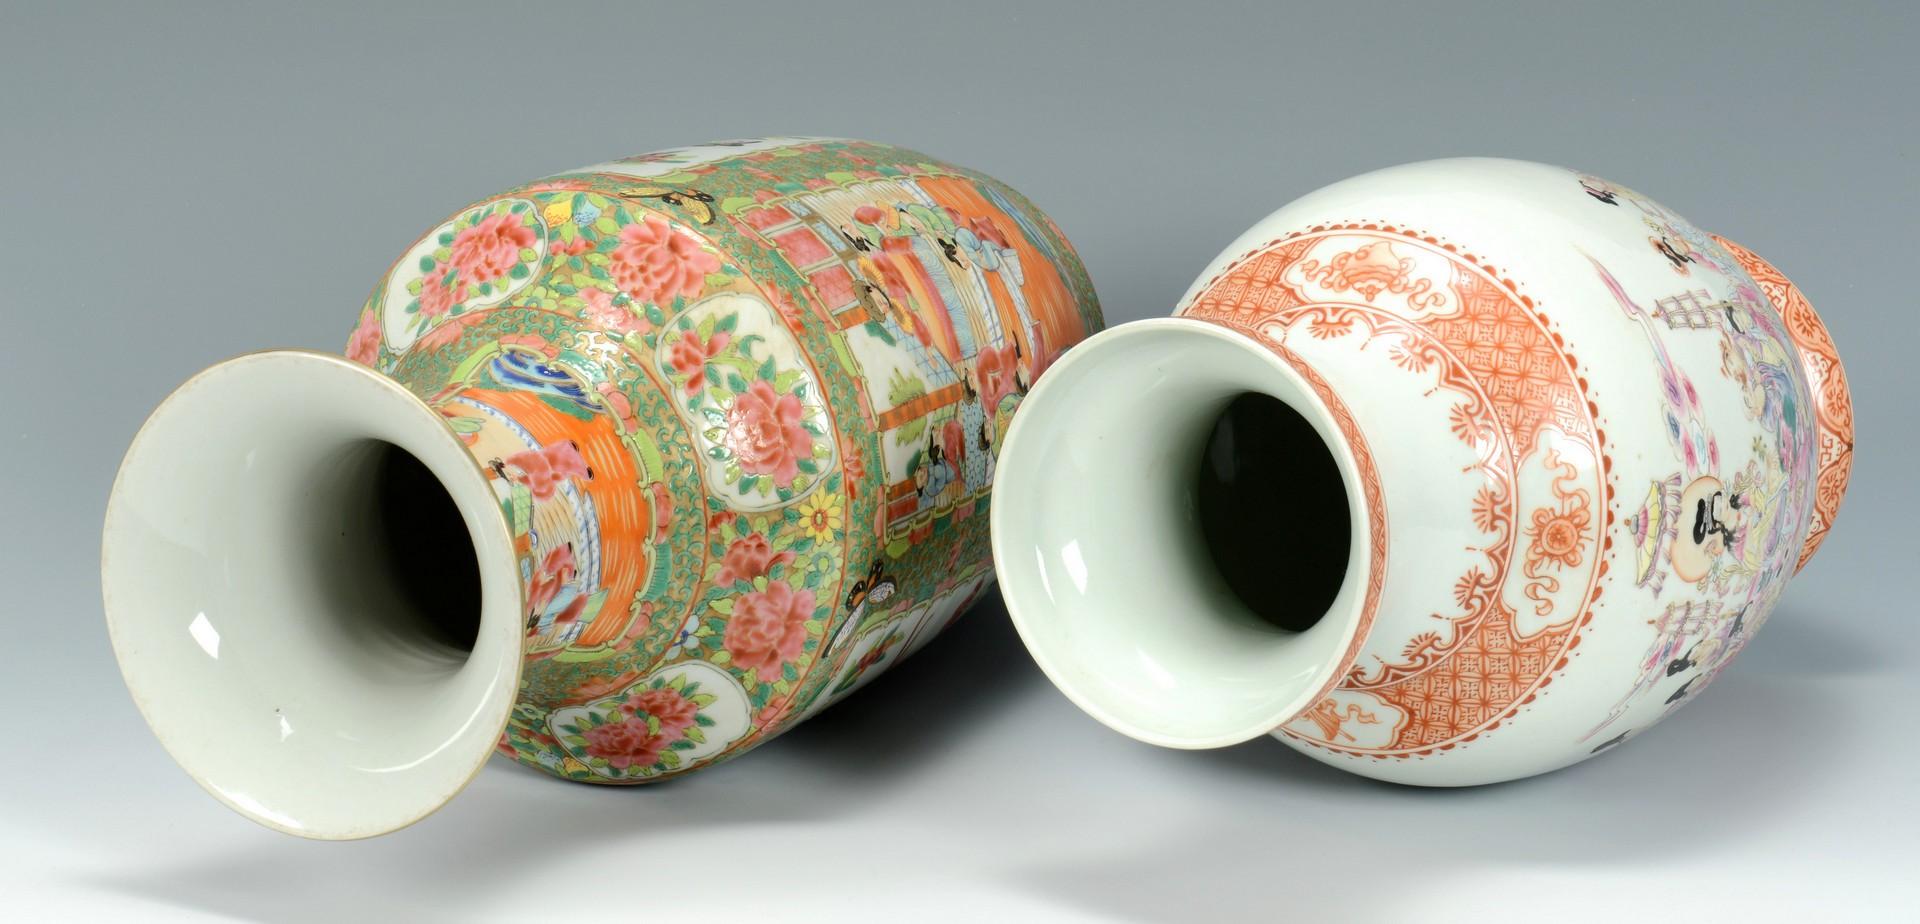 Lot 3383233: 2 Chinese Famille Rose Porcelain Vases